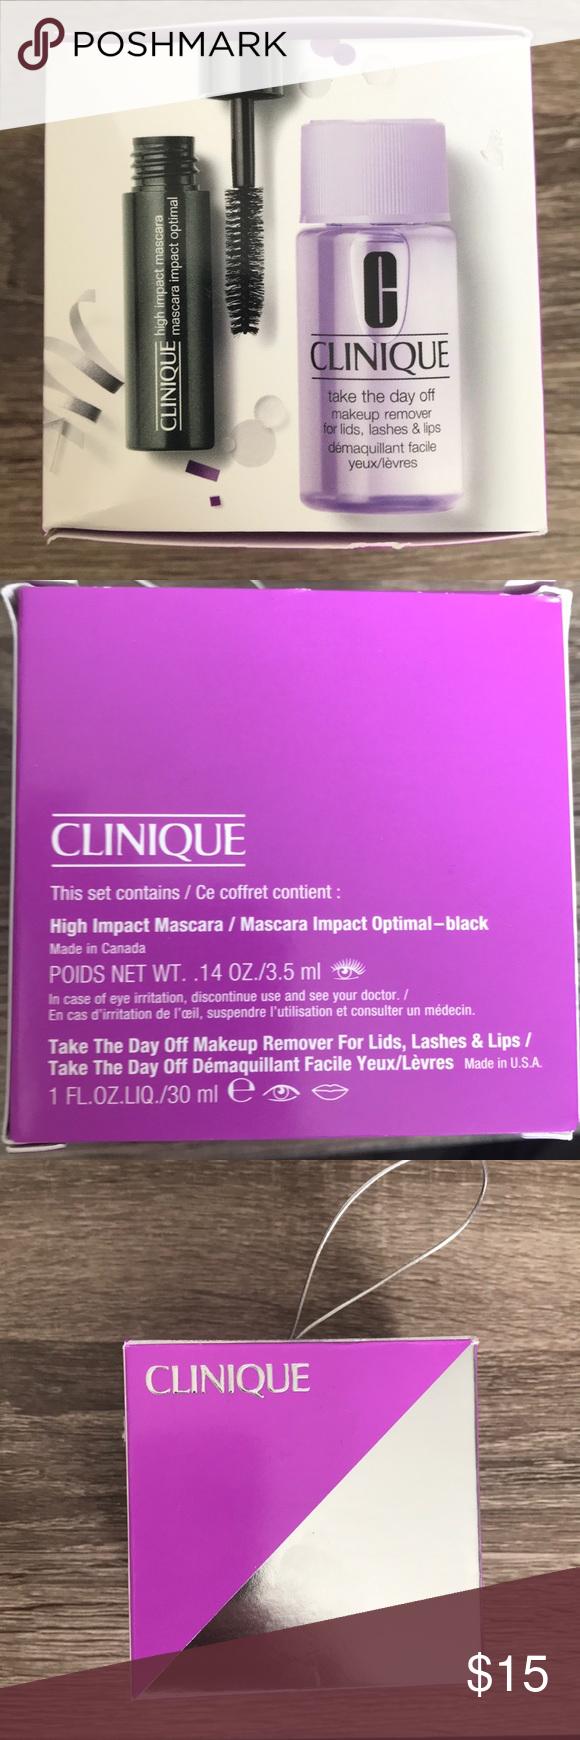 NWT Clinique Gift Set Clinique gift set, Clinique